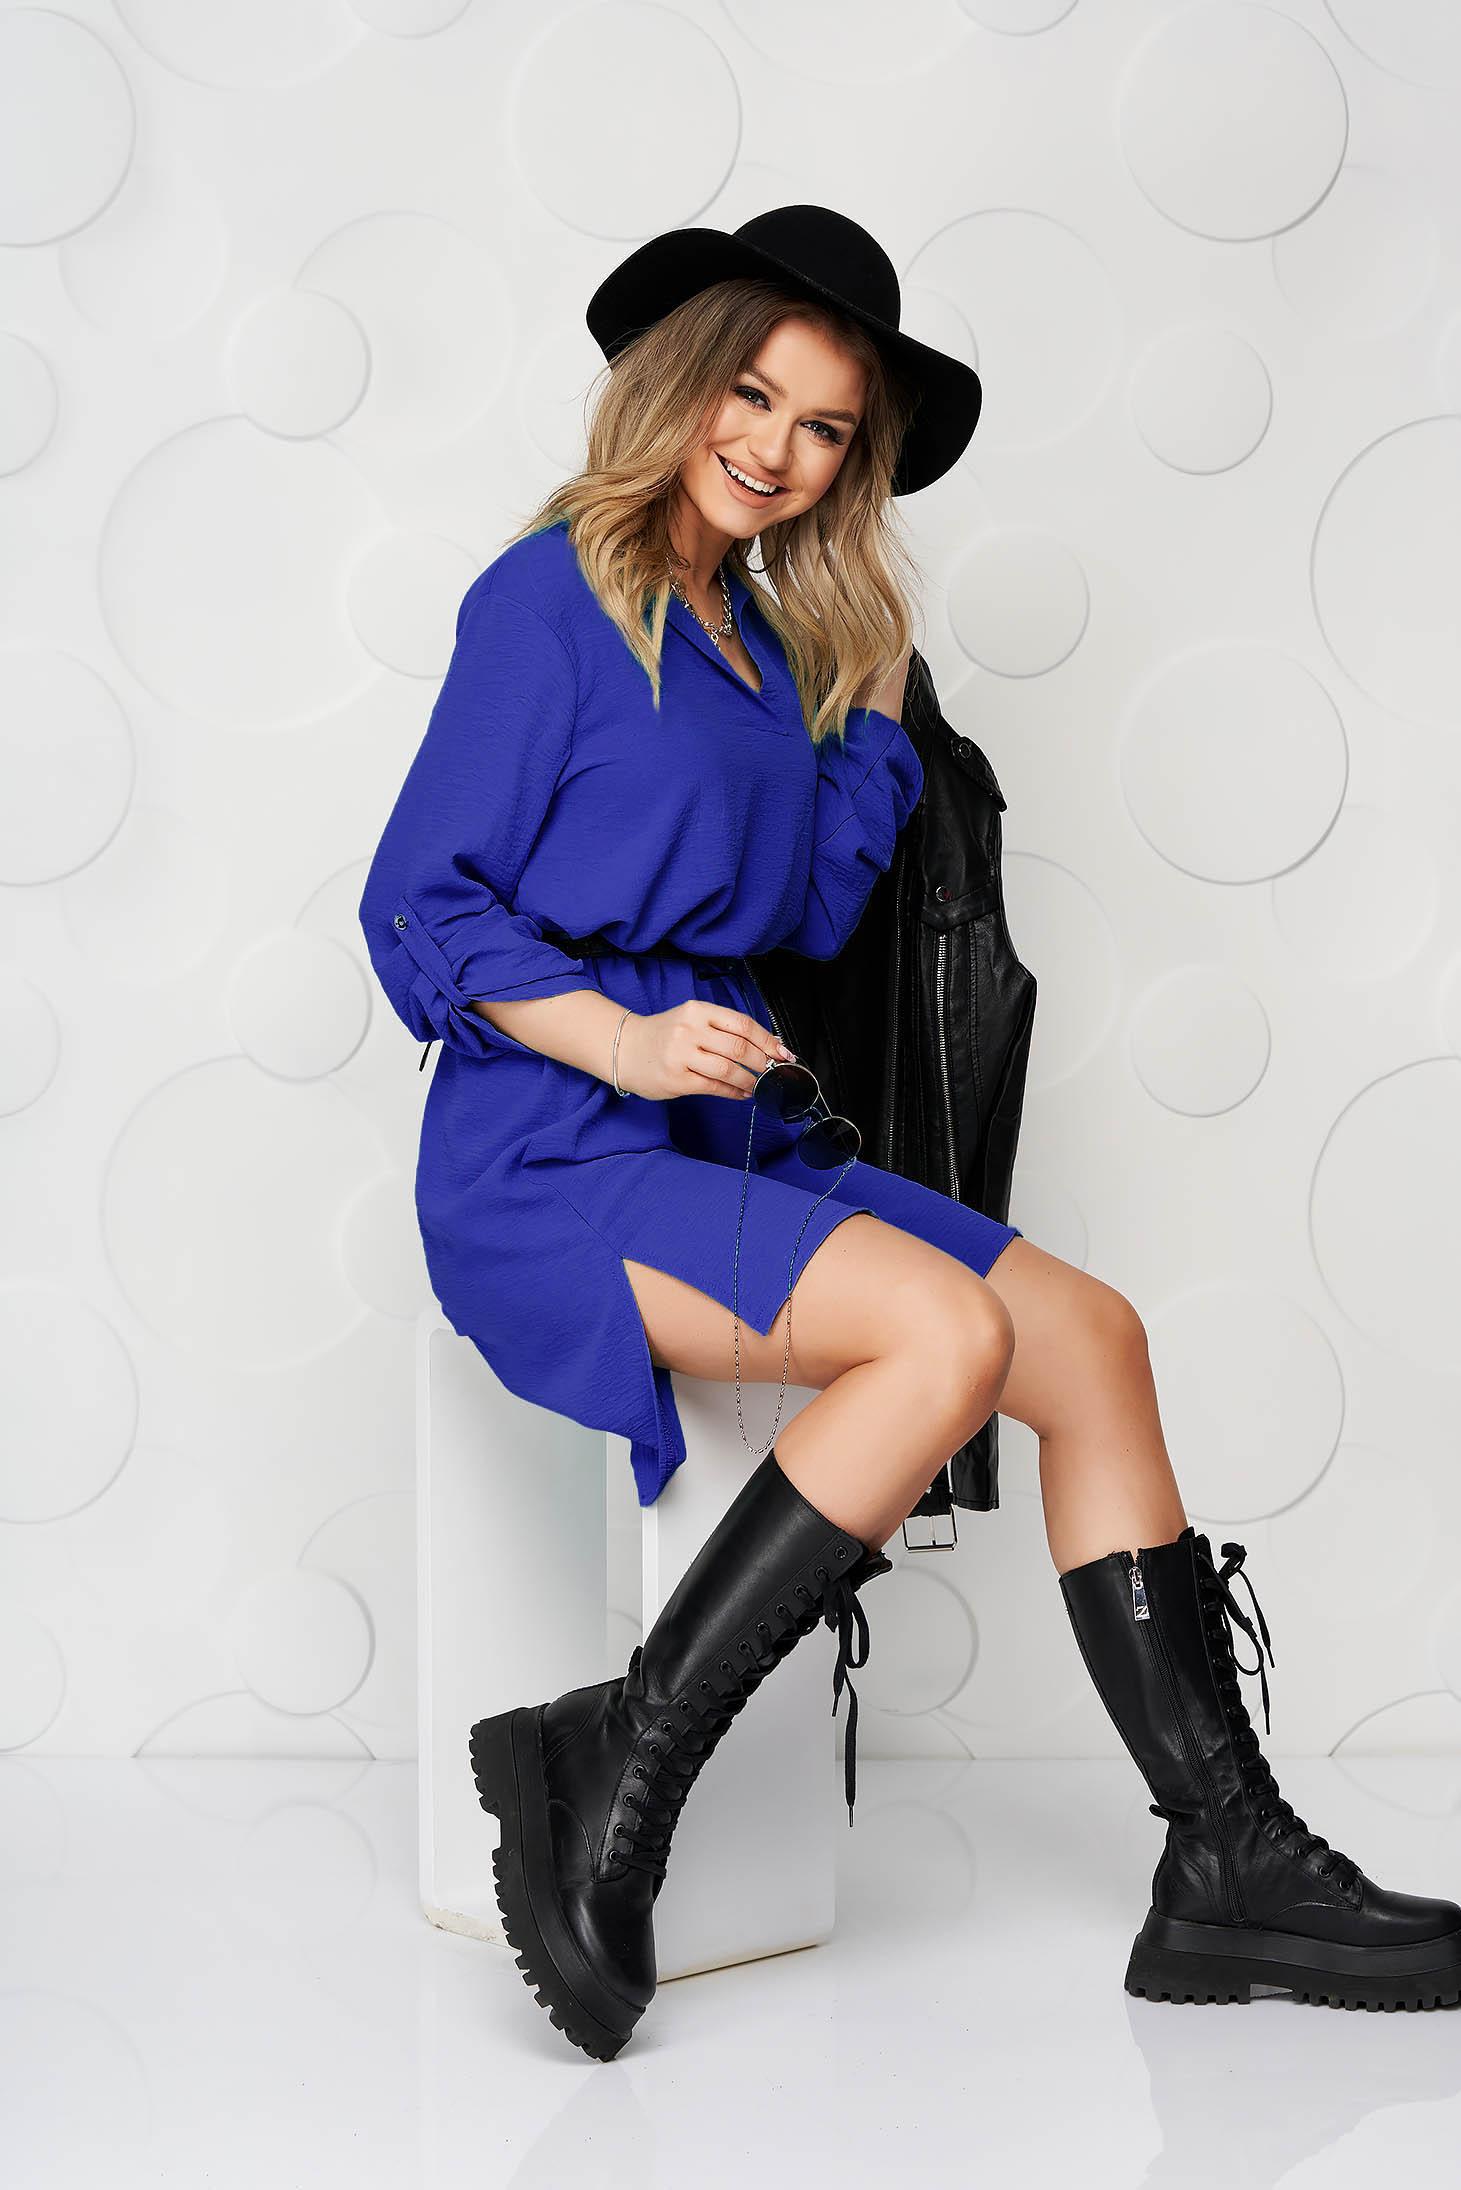 Rochie tip camasa albastra scurta de zi cu un croi drept din material subtire